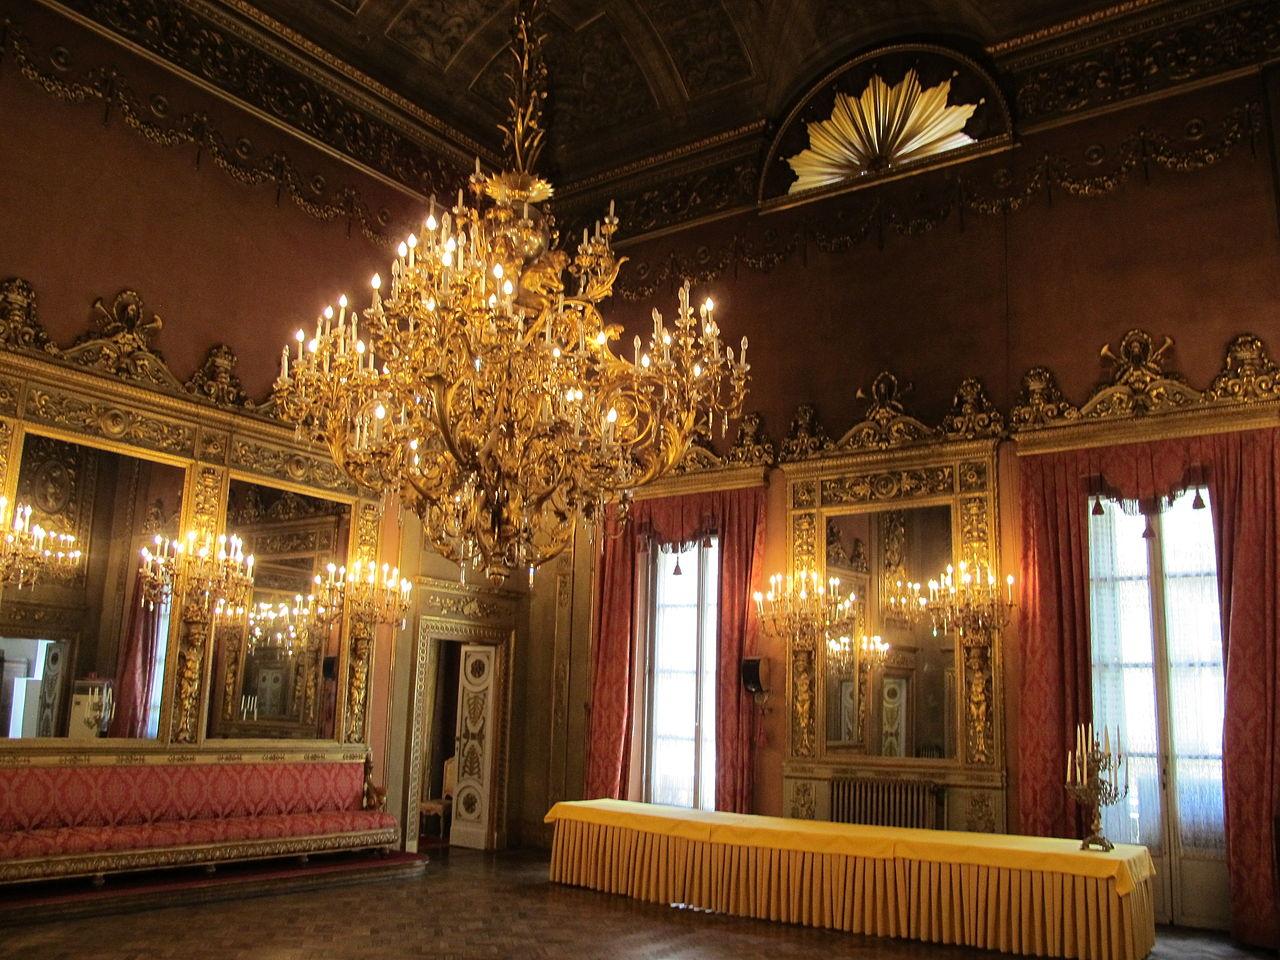 Orario Ricevimento Villa Eleonora Palermo